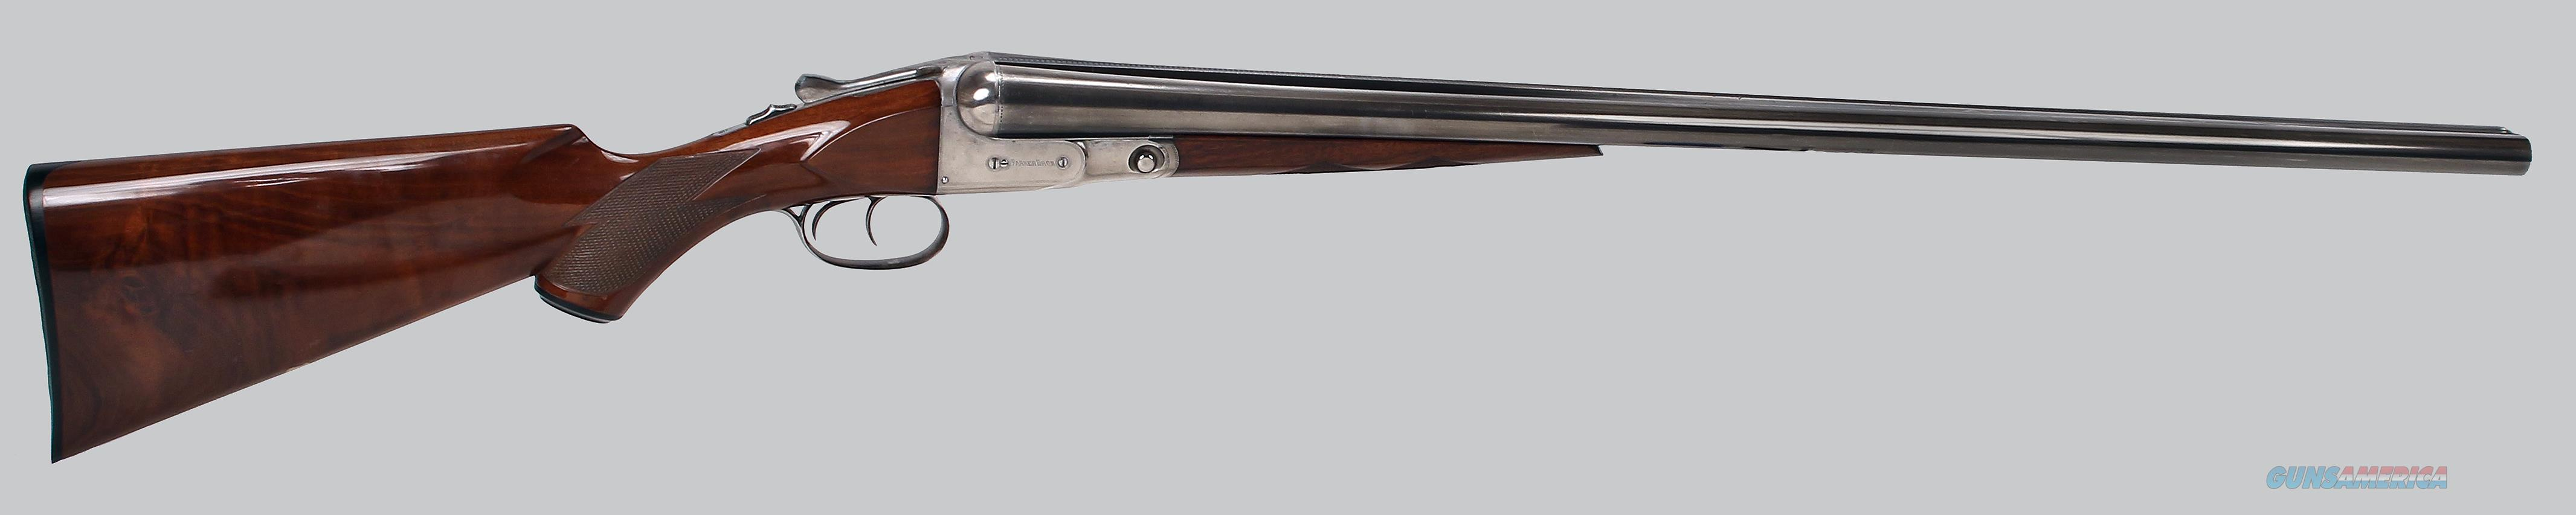 Parker Brothers Model VH SxS 12ga Shotgun  Guns > Shotguns > Parker Shotguns